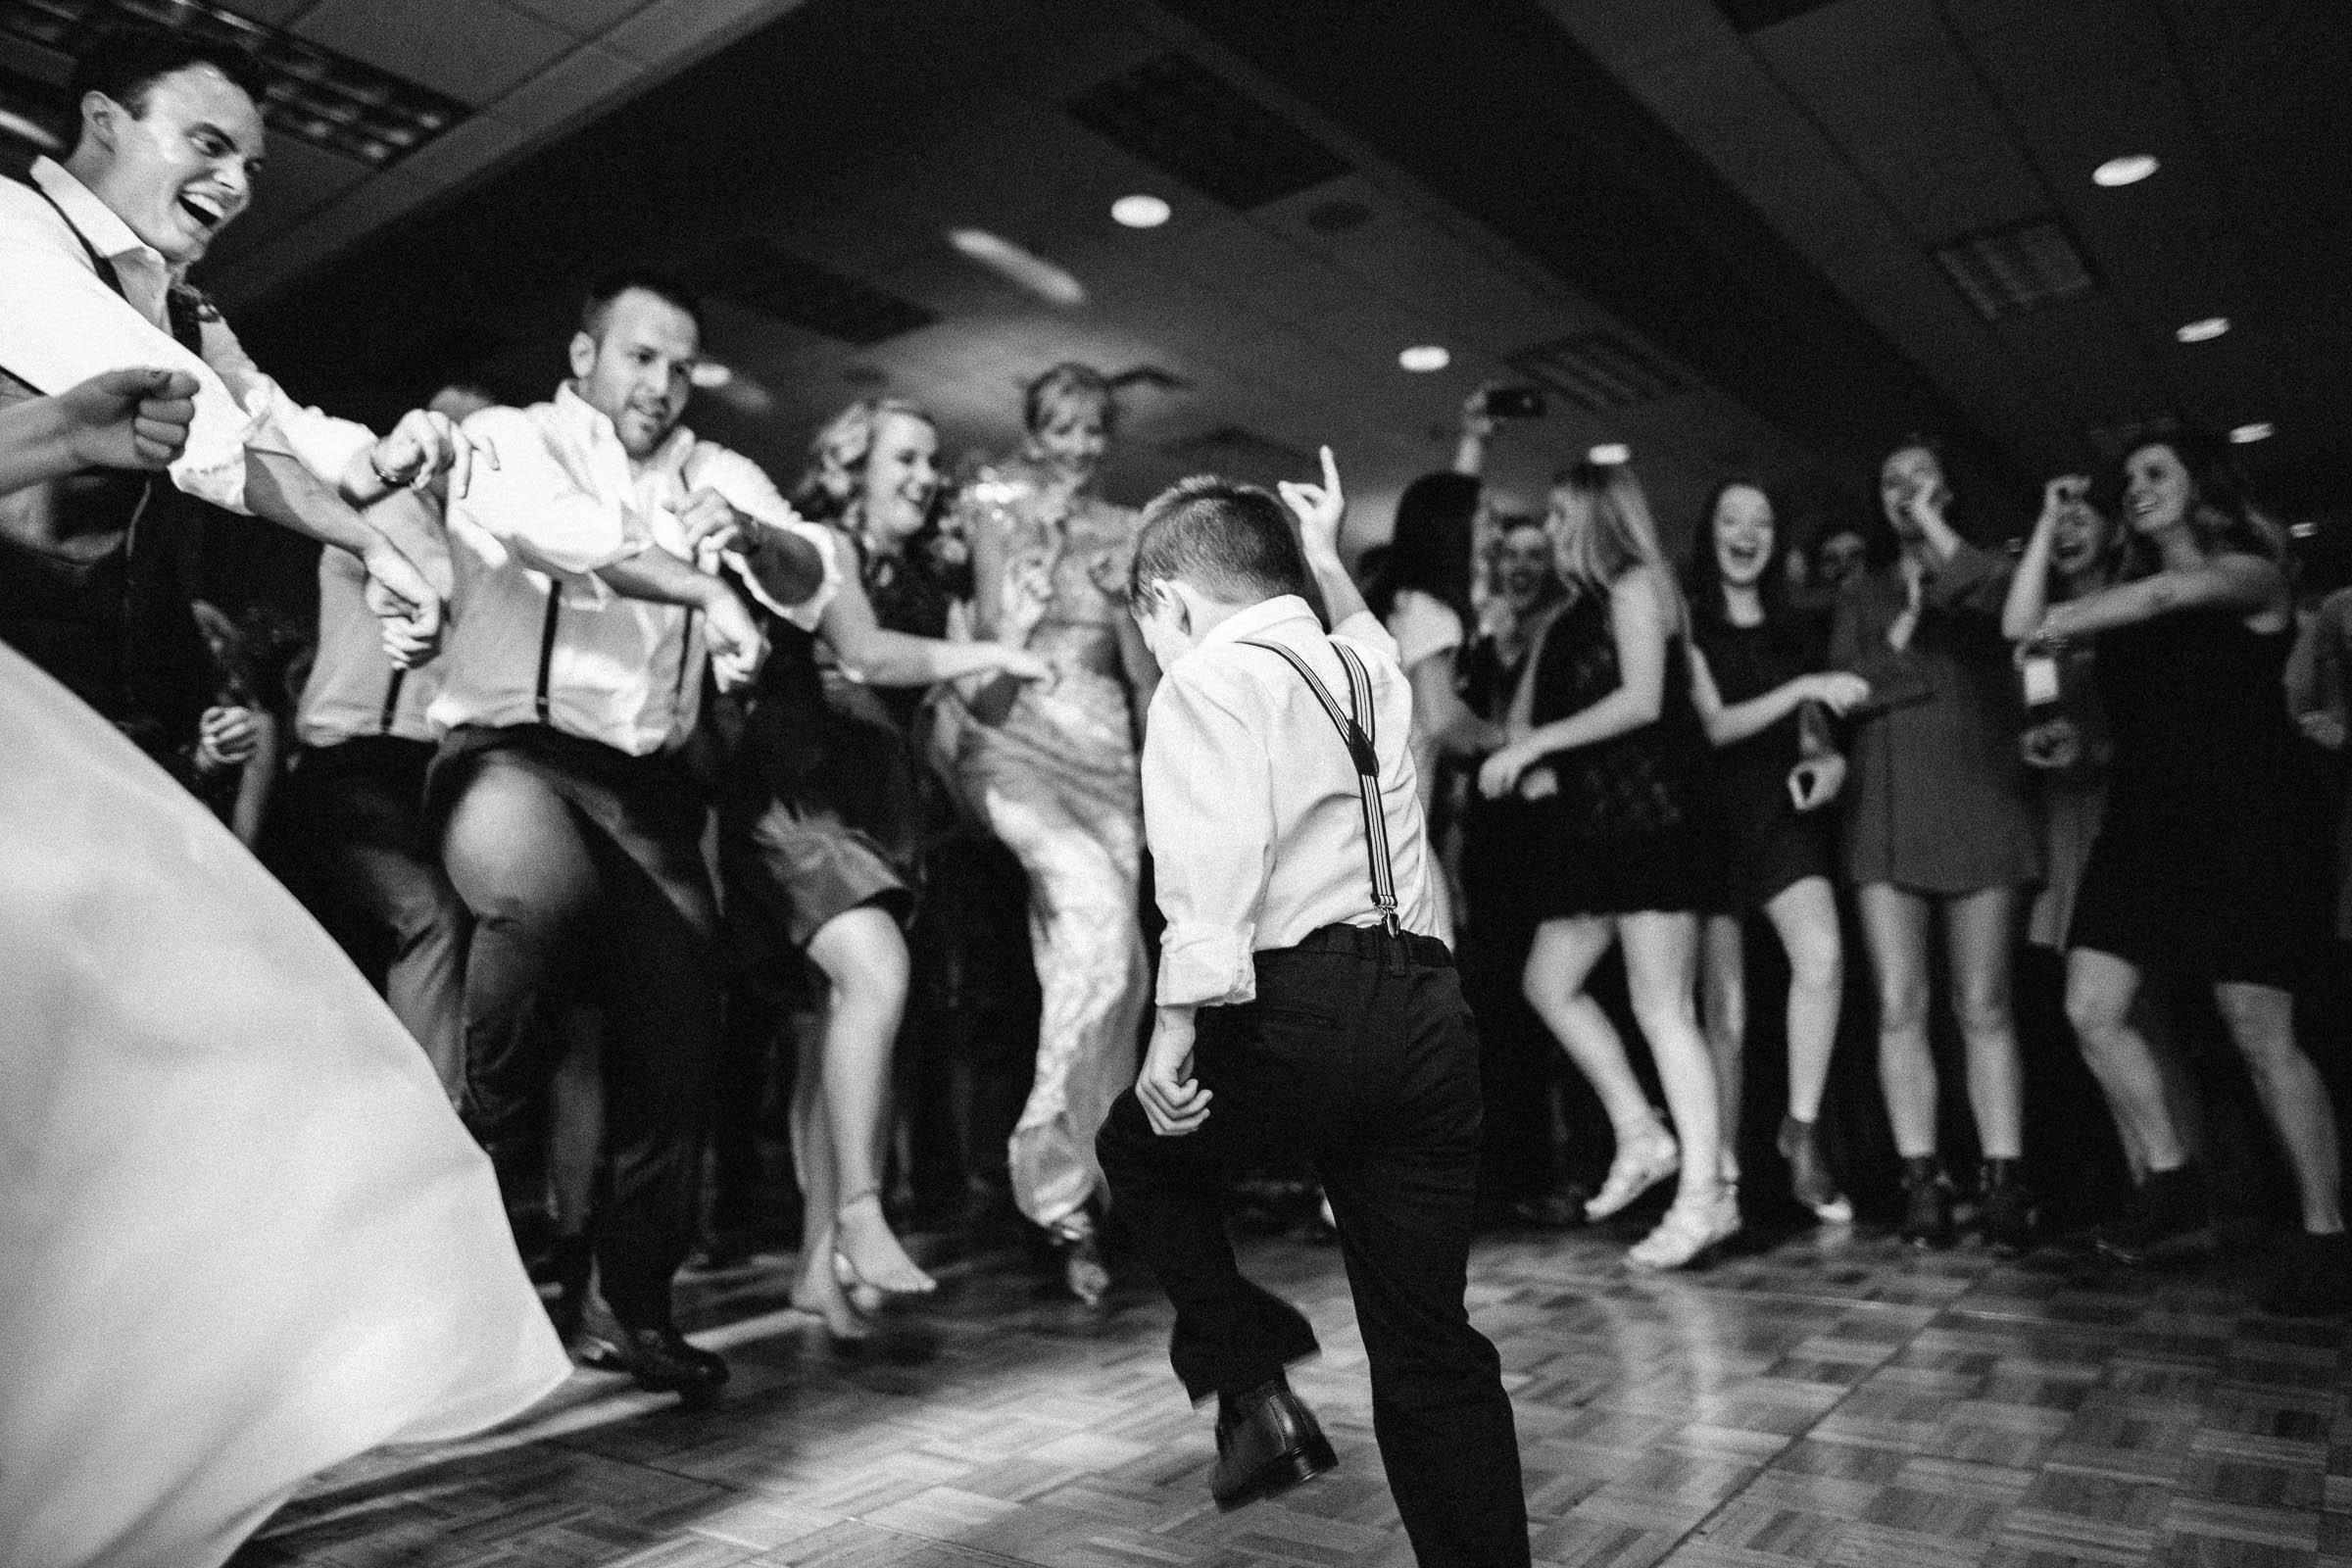 Jenna&Austin_SiouxFalls_Wedding_Photographer_123.jpg